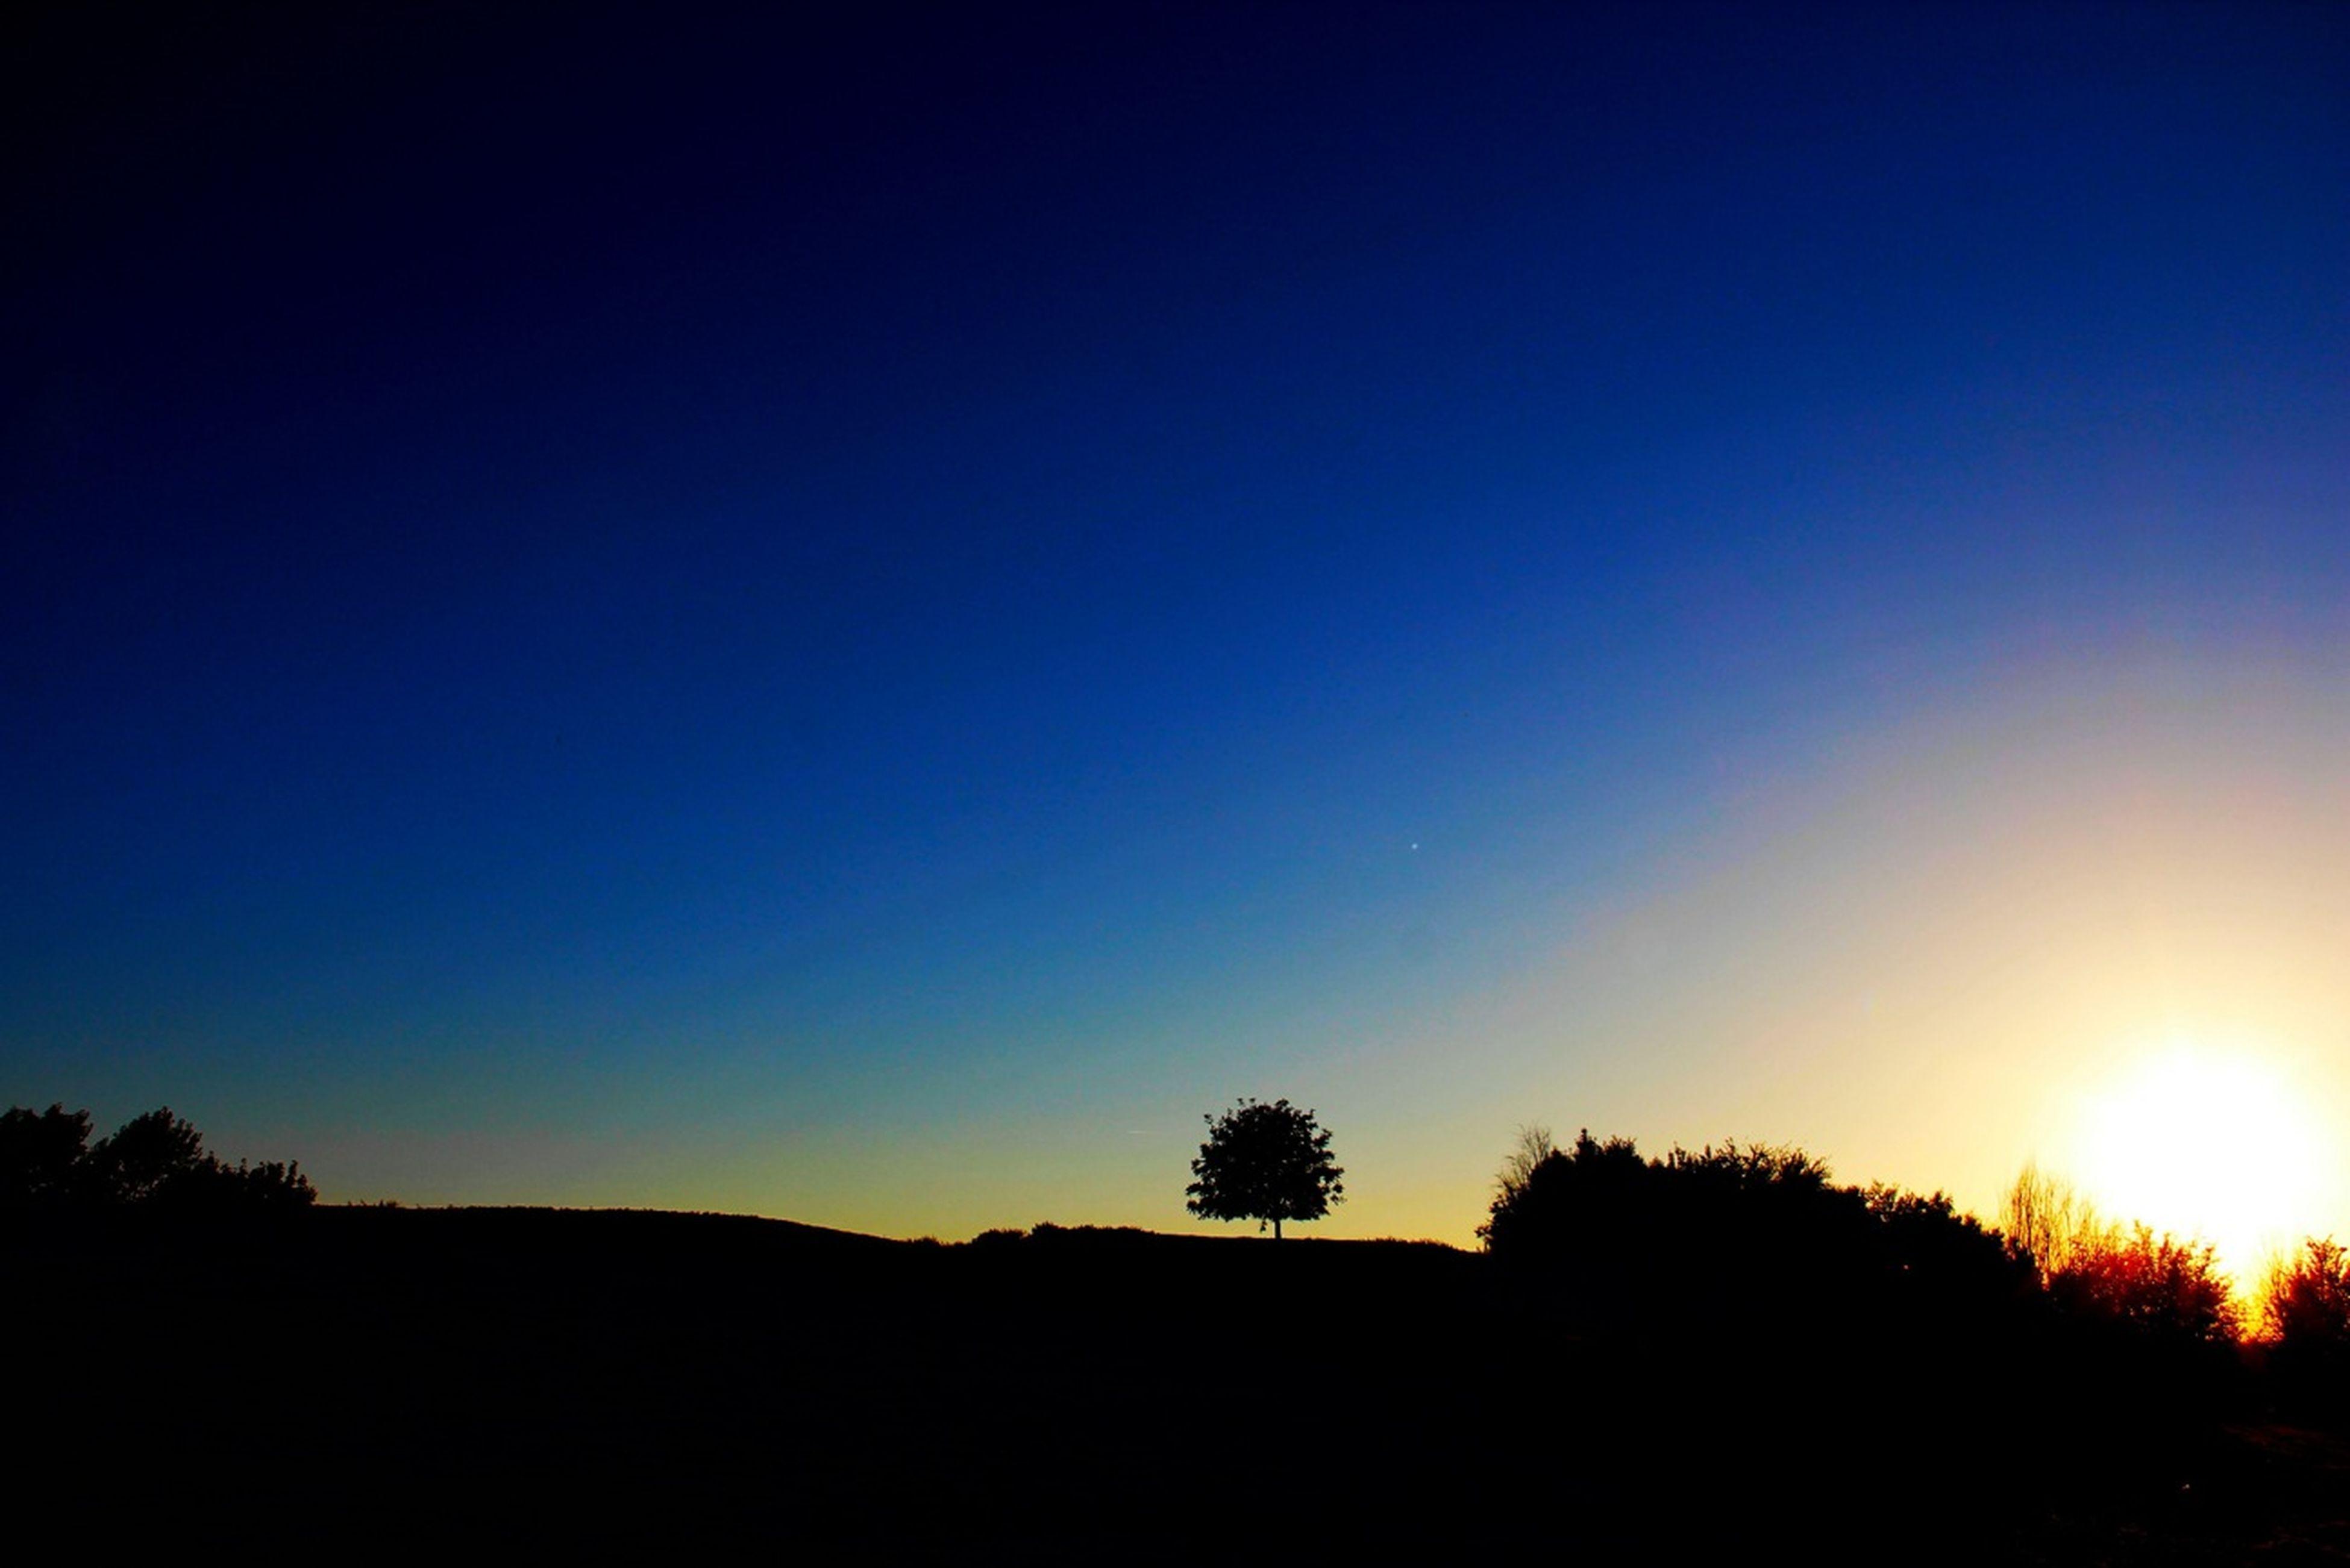 silhouette, sunset, copy space, tranquil scene, clear sky, scenics, tranquility, beauty in nature, tree, nature, landscape, idyllic, orange color, dark, blue, dusk, sun, sky, outline, non-urban scene